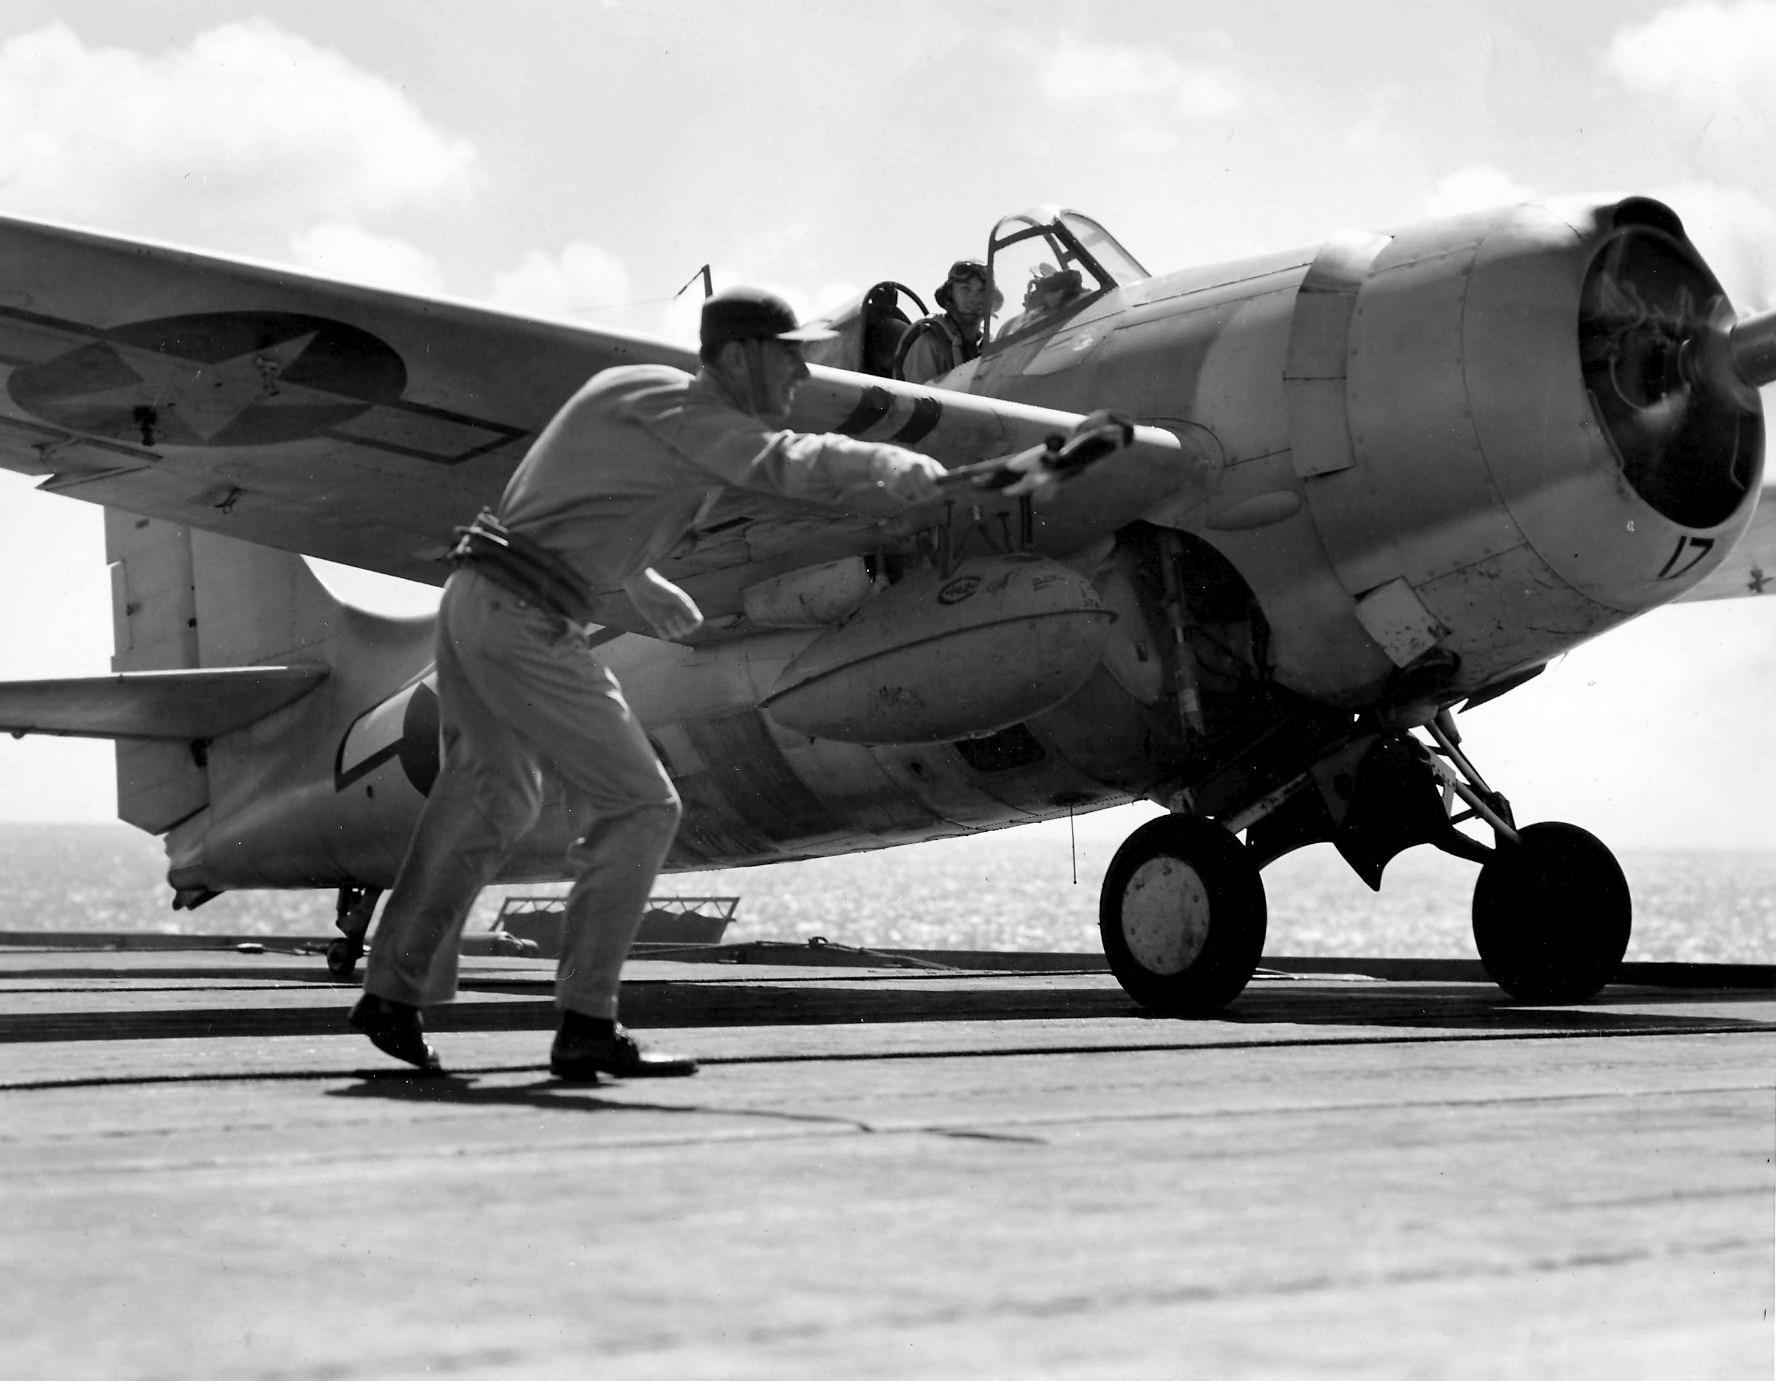 Aircrew Ensign R K Rountree photo series FM 1 Wildcat Black 17 preparing for flight April 1944 01